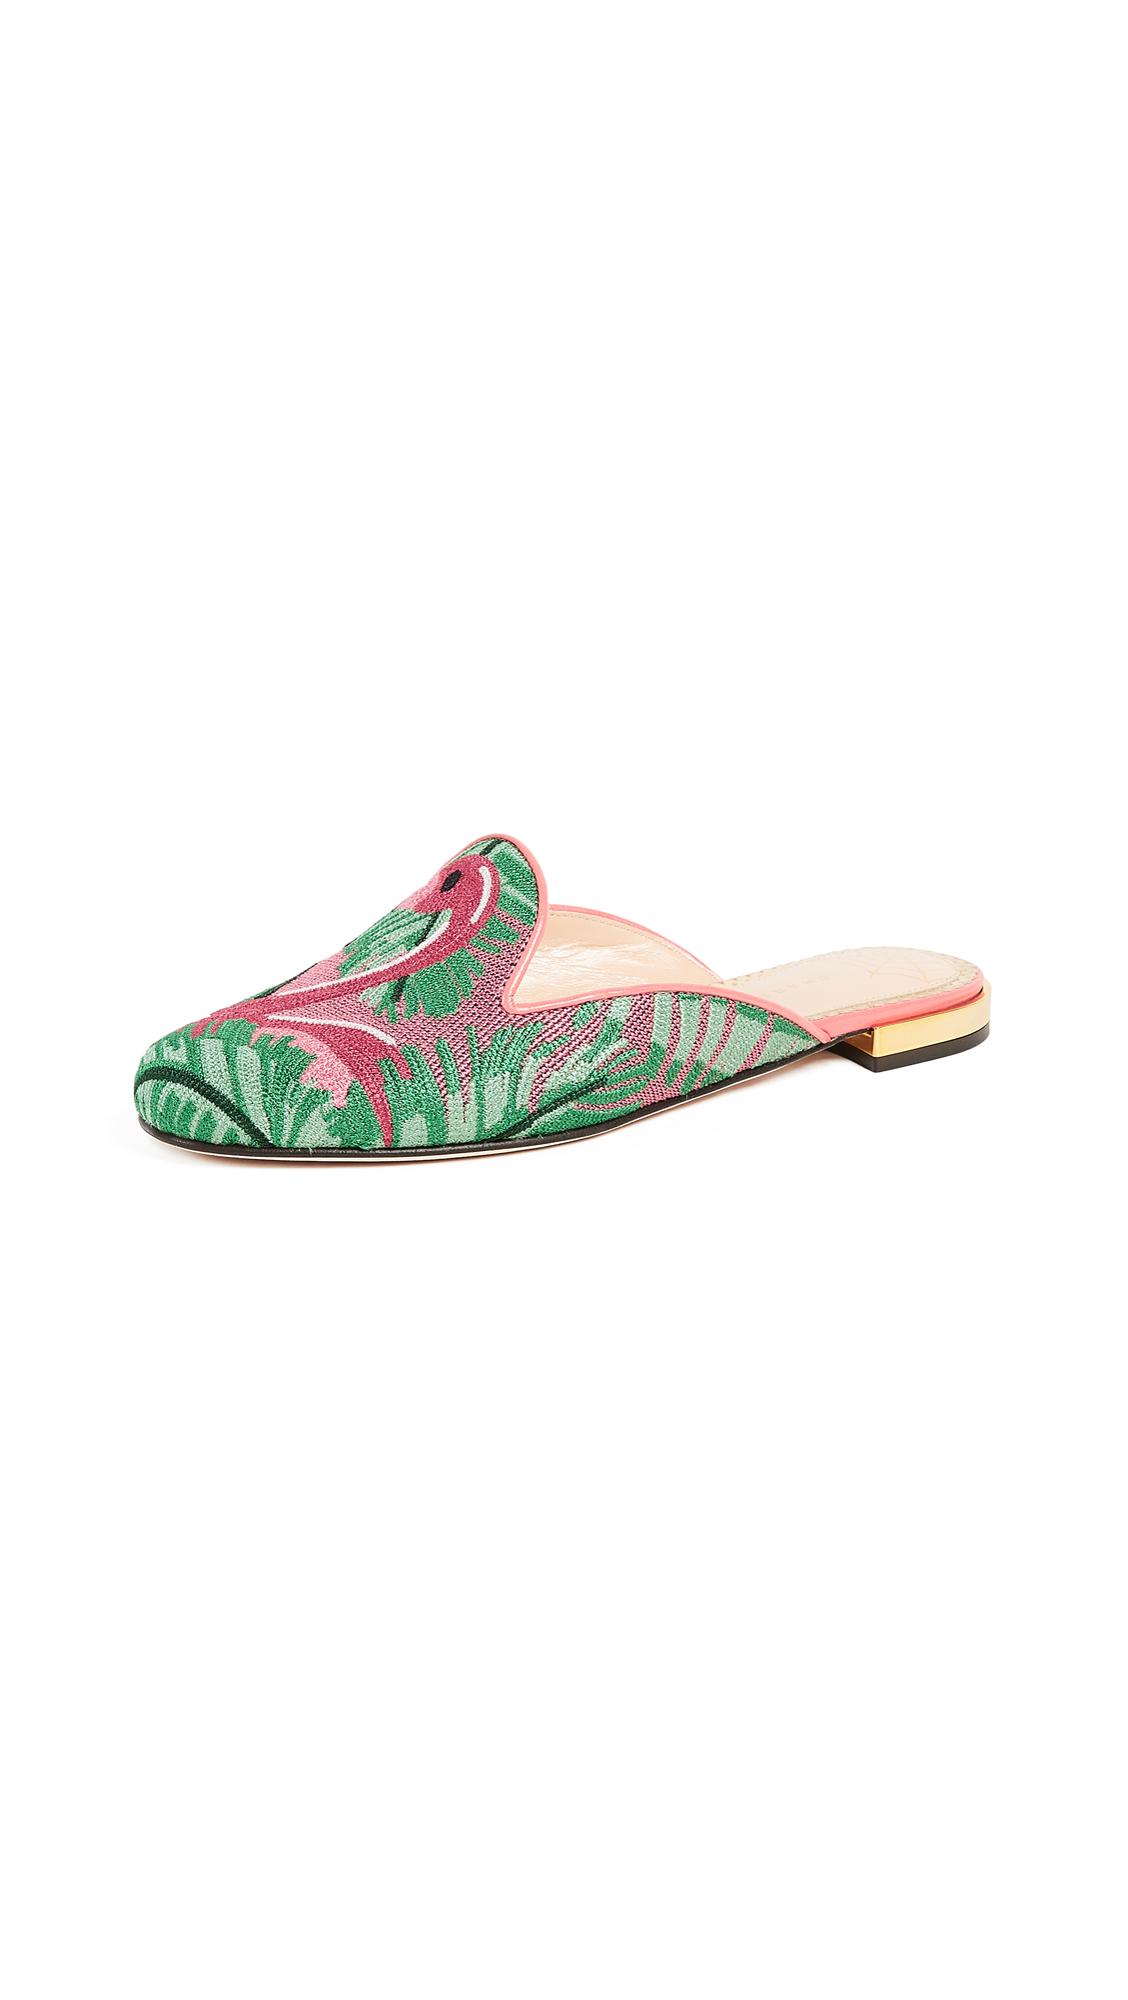 Charlotte Olympia Flamingo Slipper Mules - Multi